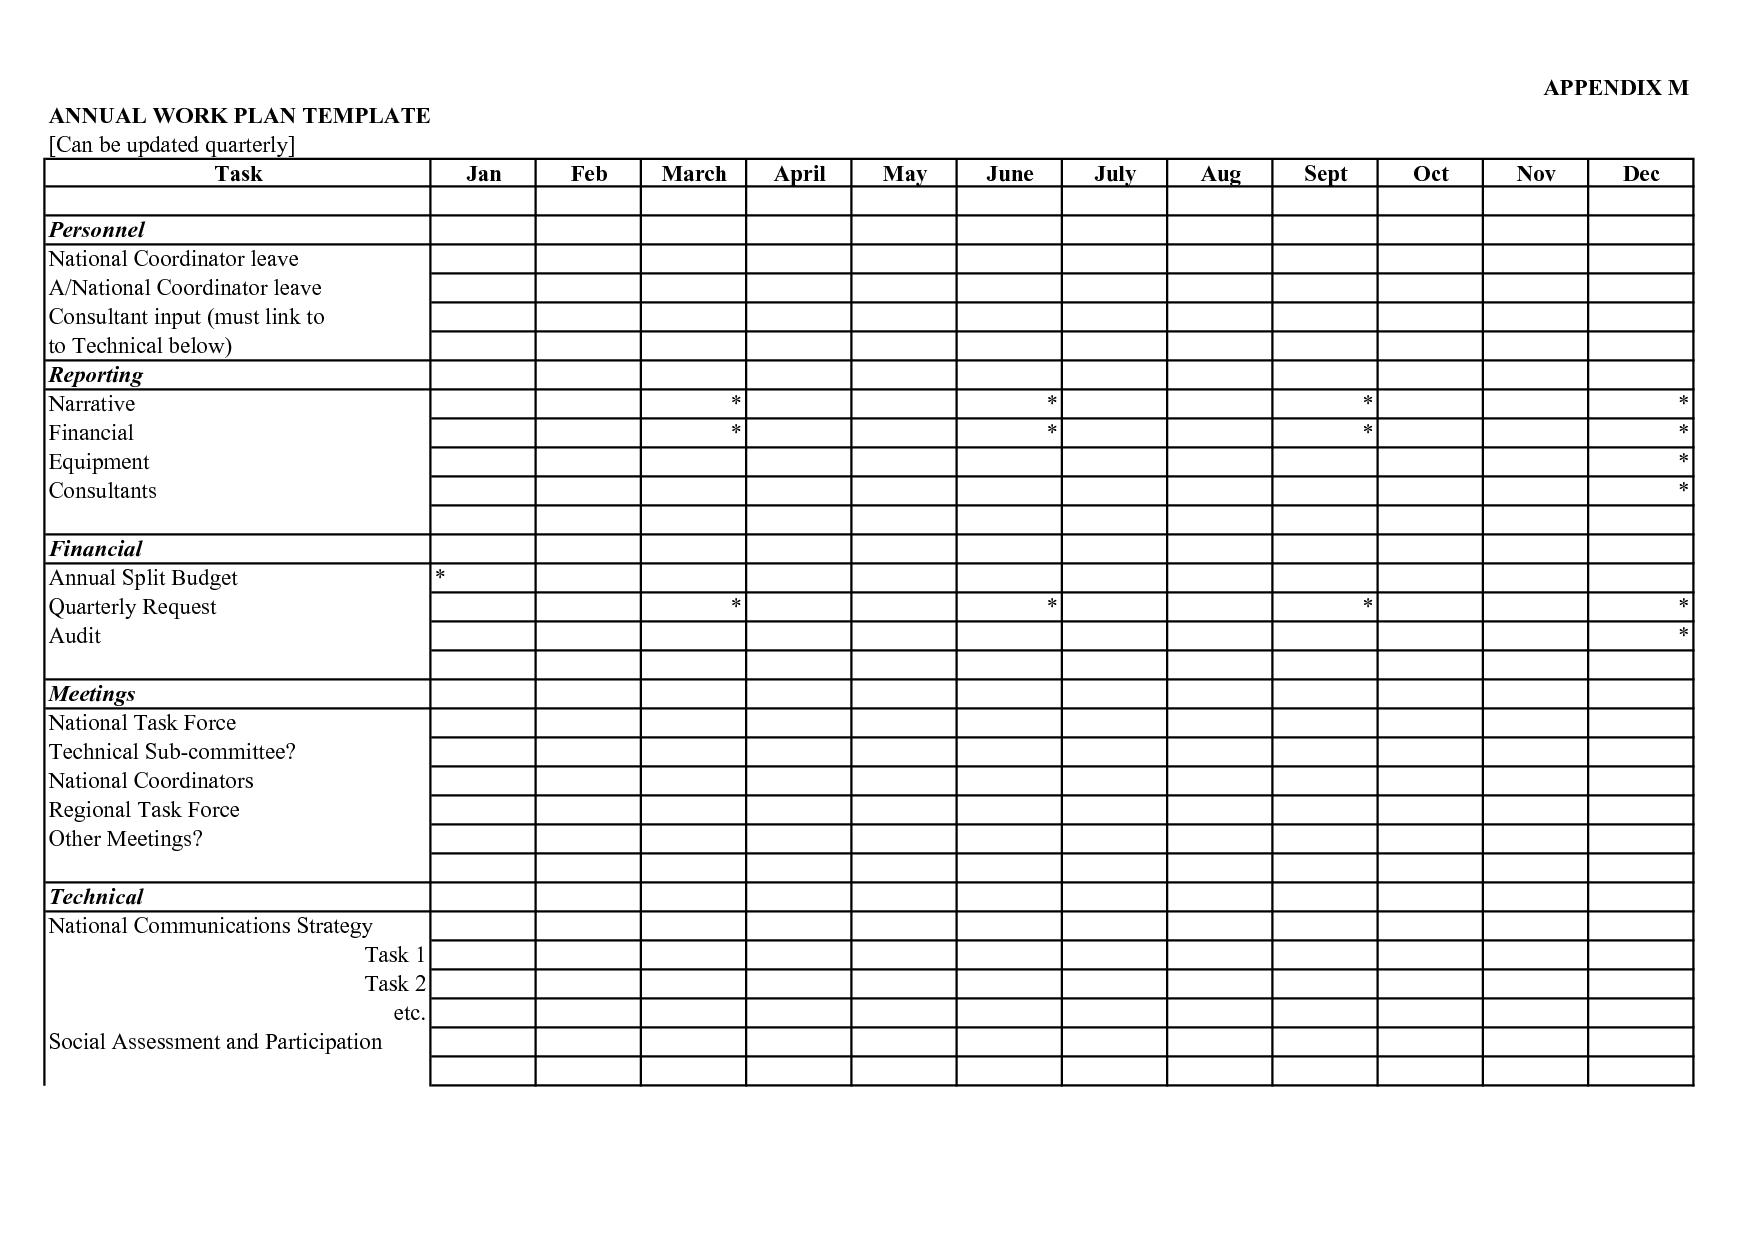 Work Plan Template Appendix M